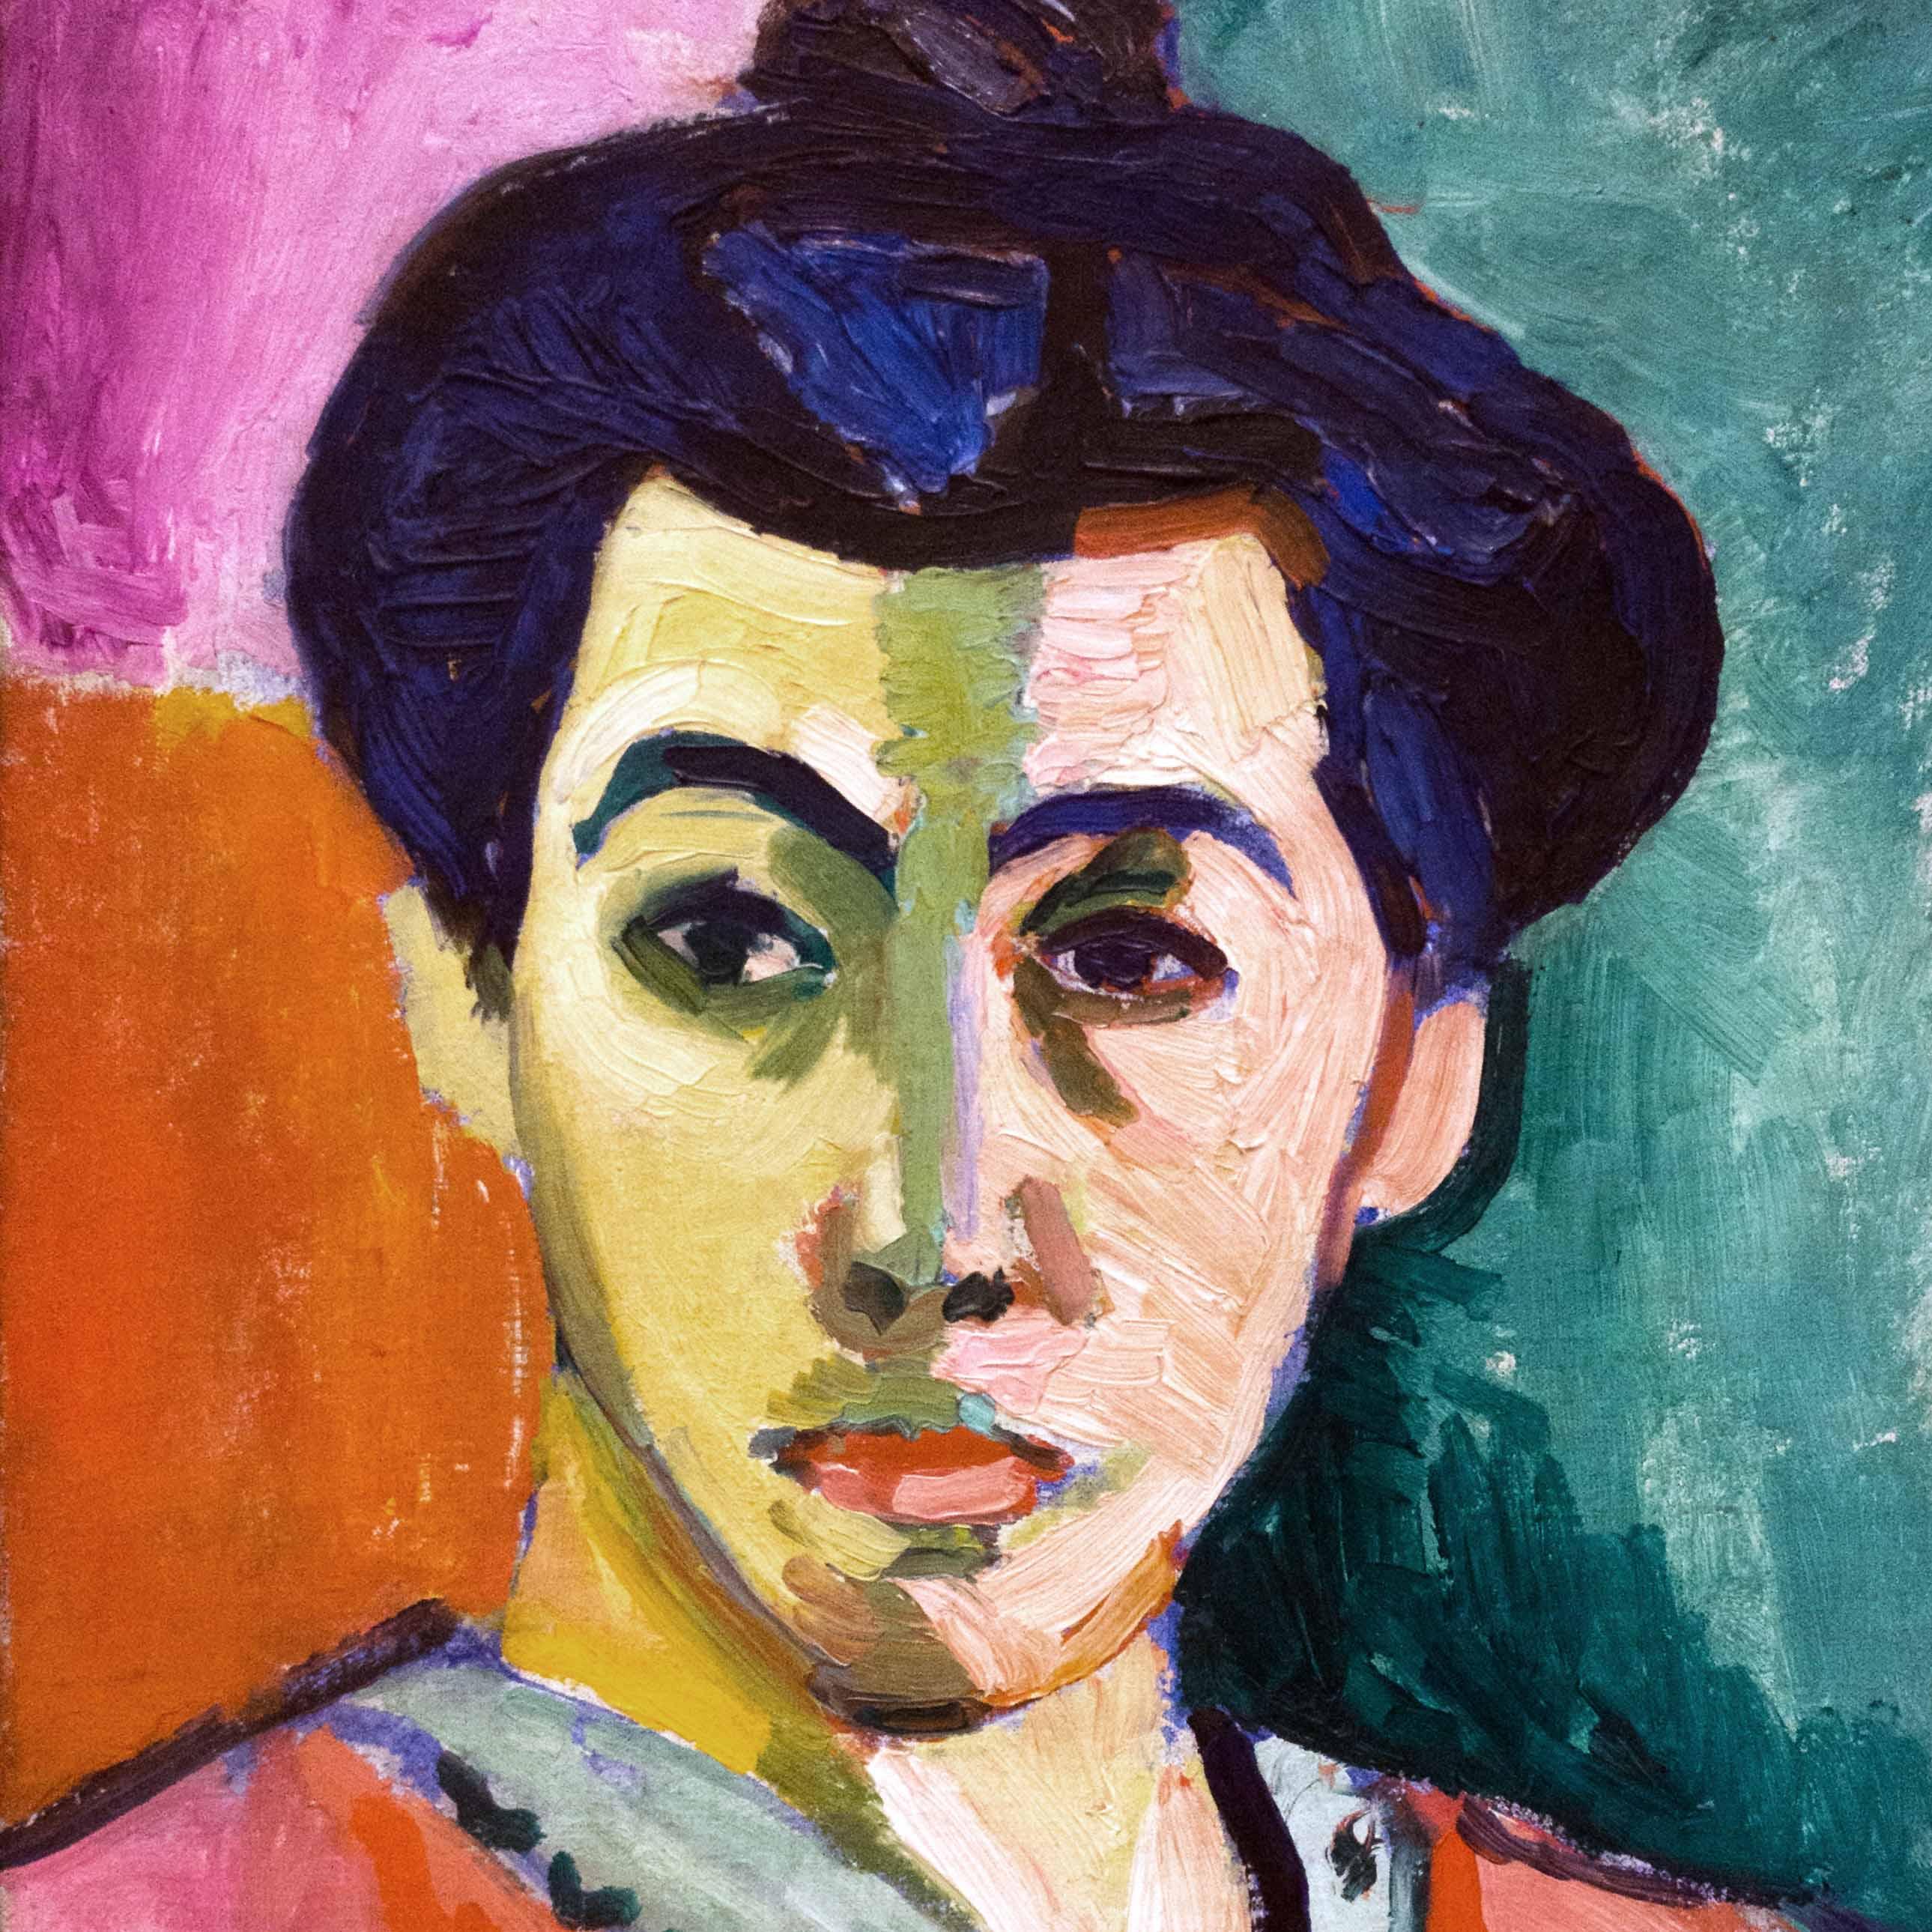 Henri Matisse, The Green Stripe (Portrait of Mme Matisse), 1905.